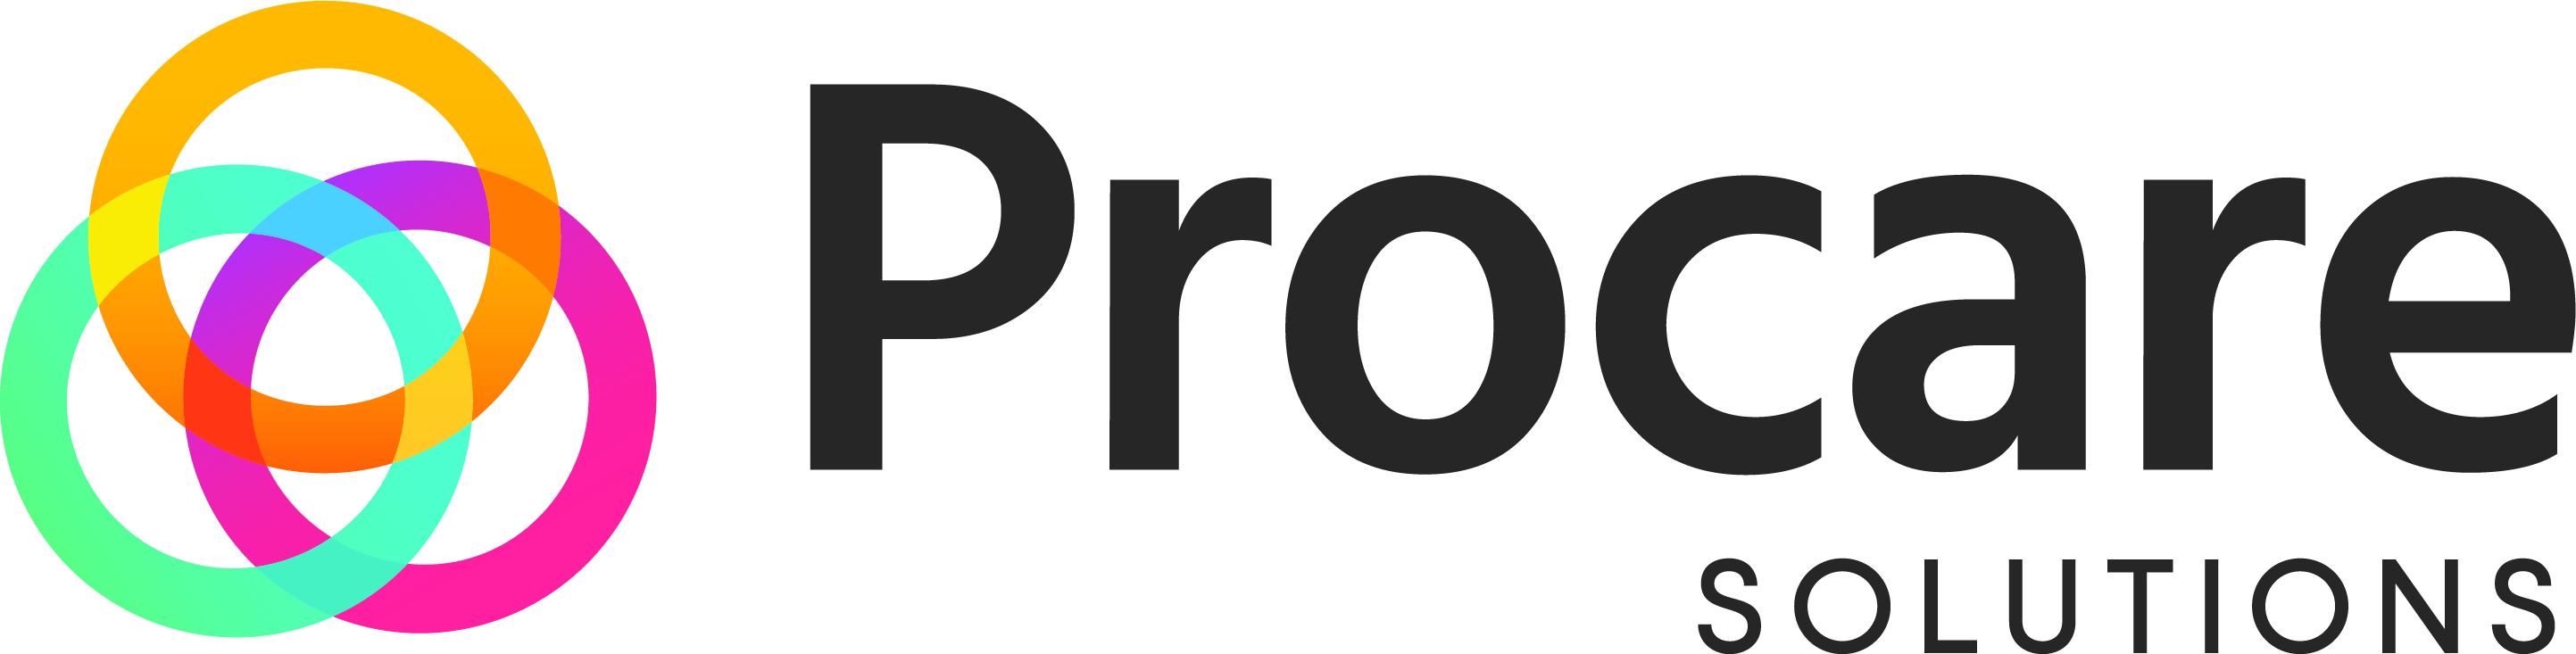 Procare Online